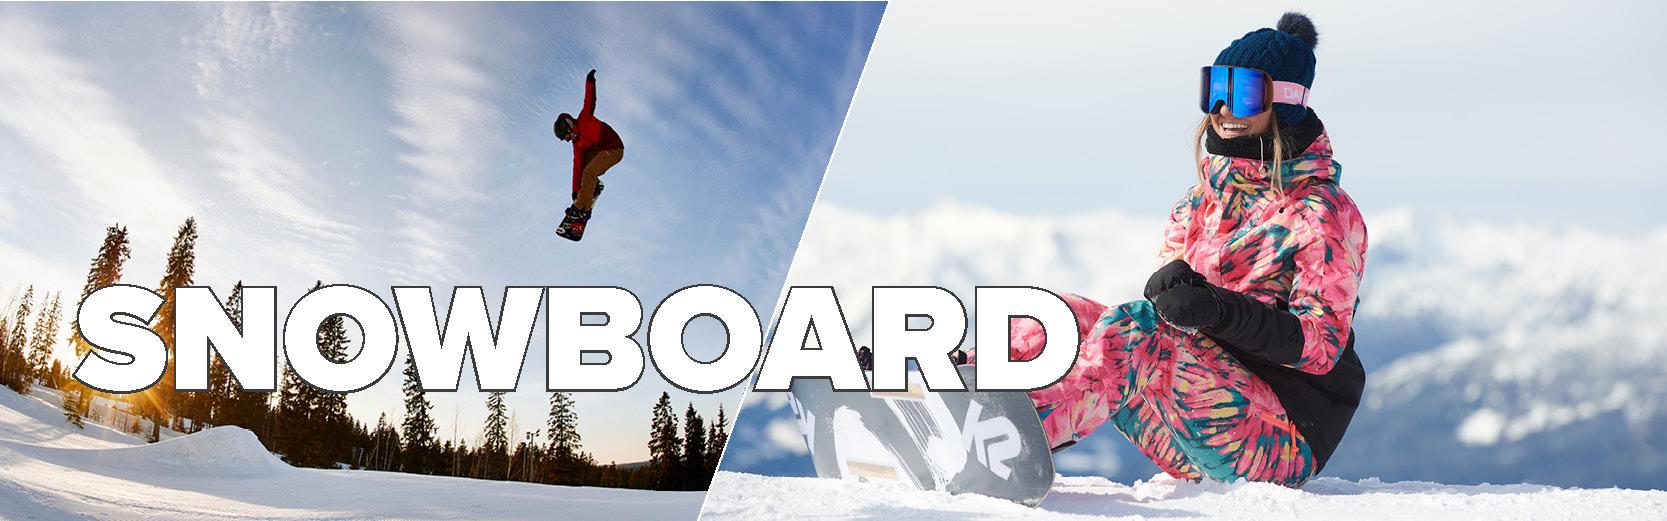 Snowboardverhuur